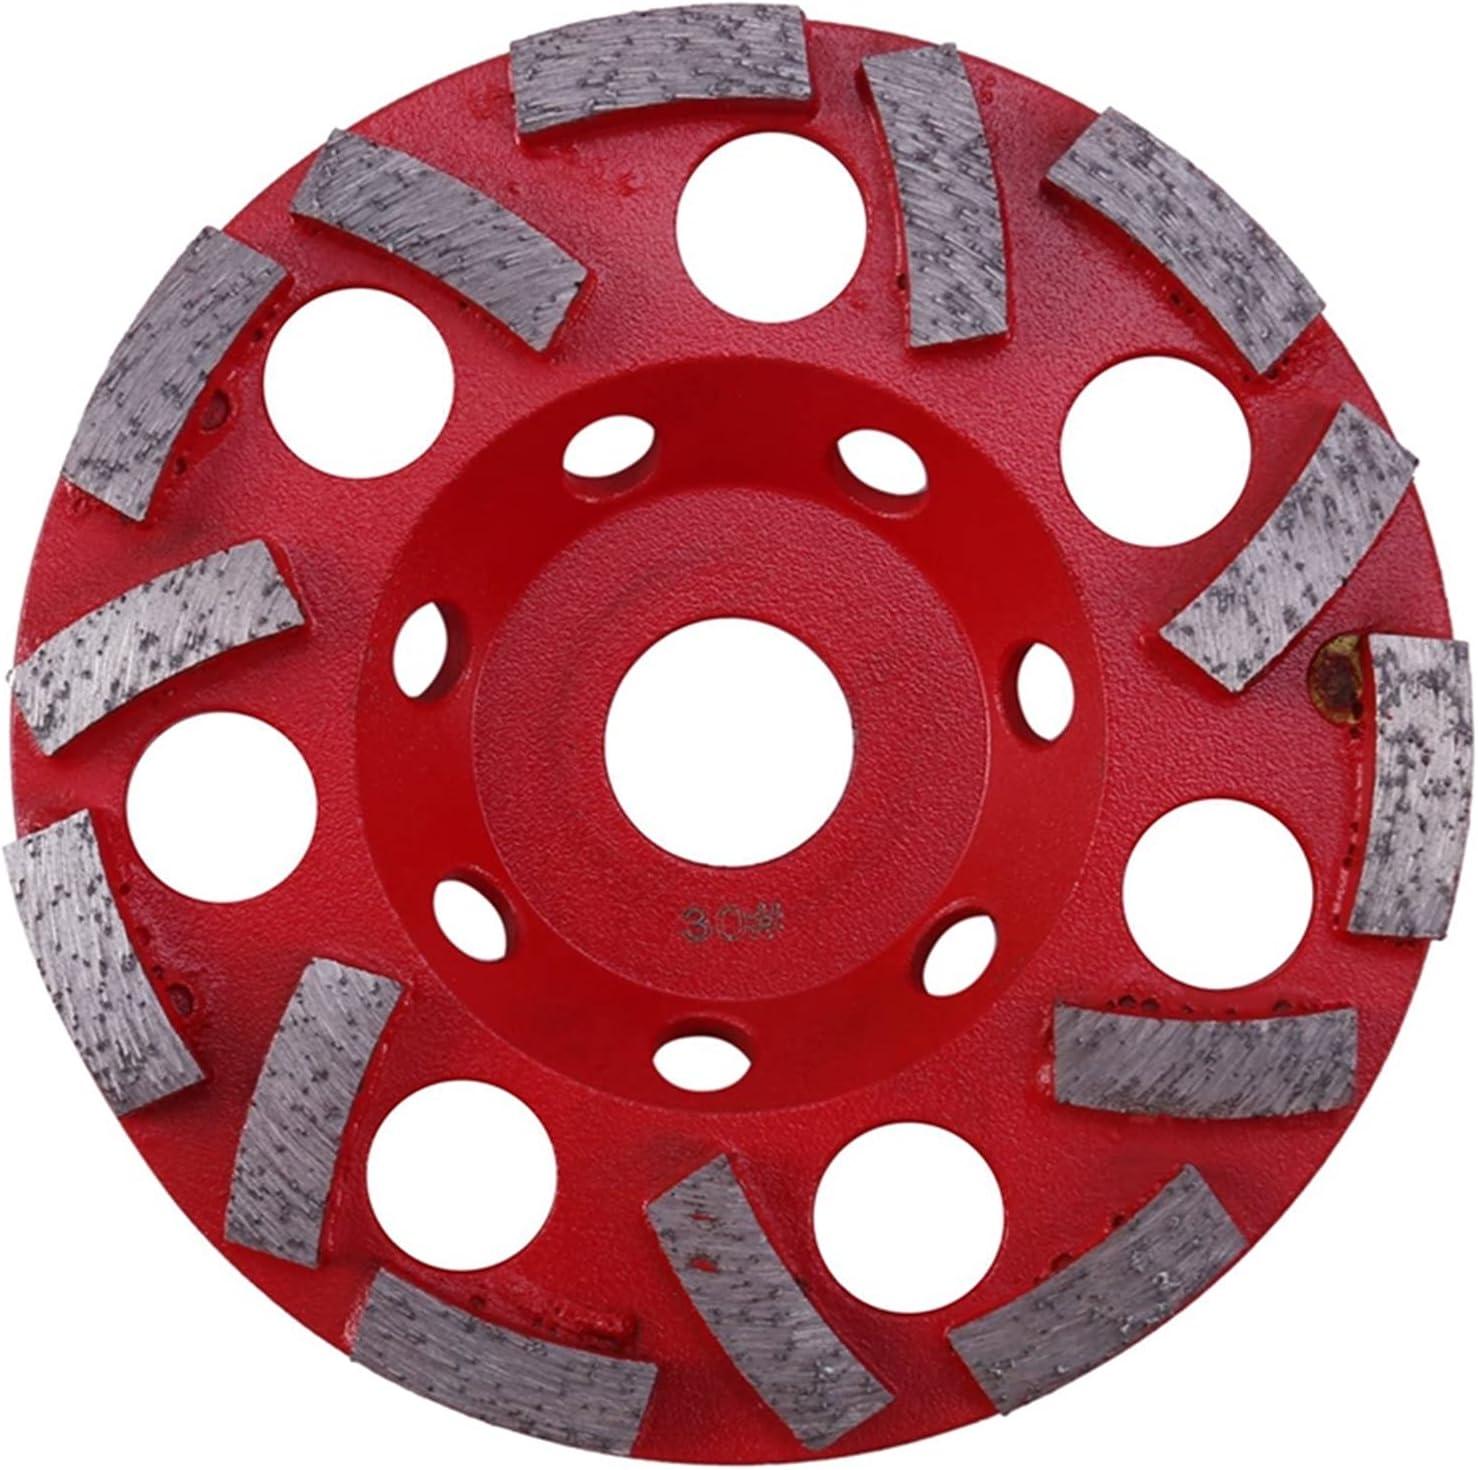 Choice YYDMBH Cutting wheele 125mm Diamond A Max 86% OFF Turbo Grinding Double Disc